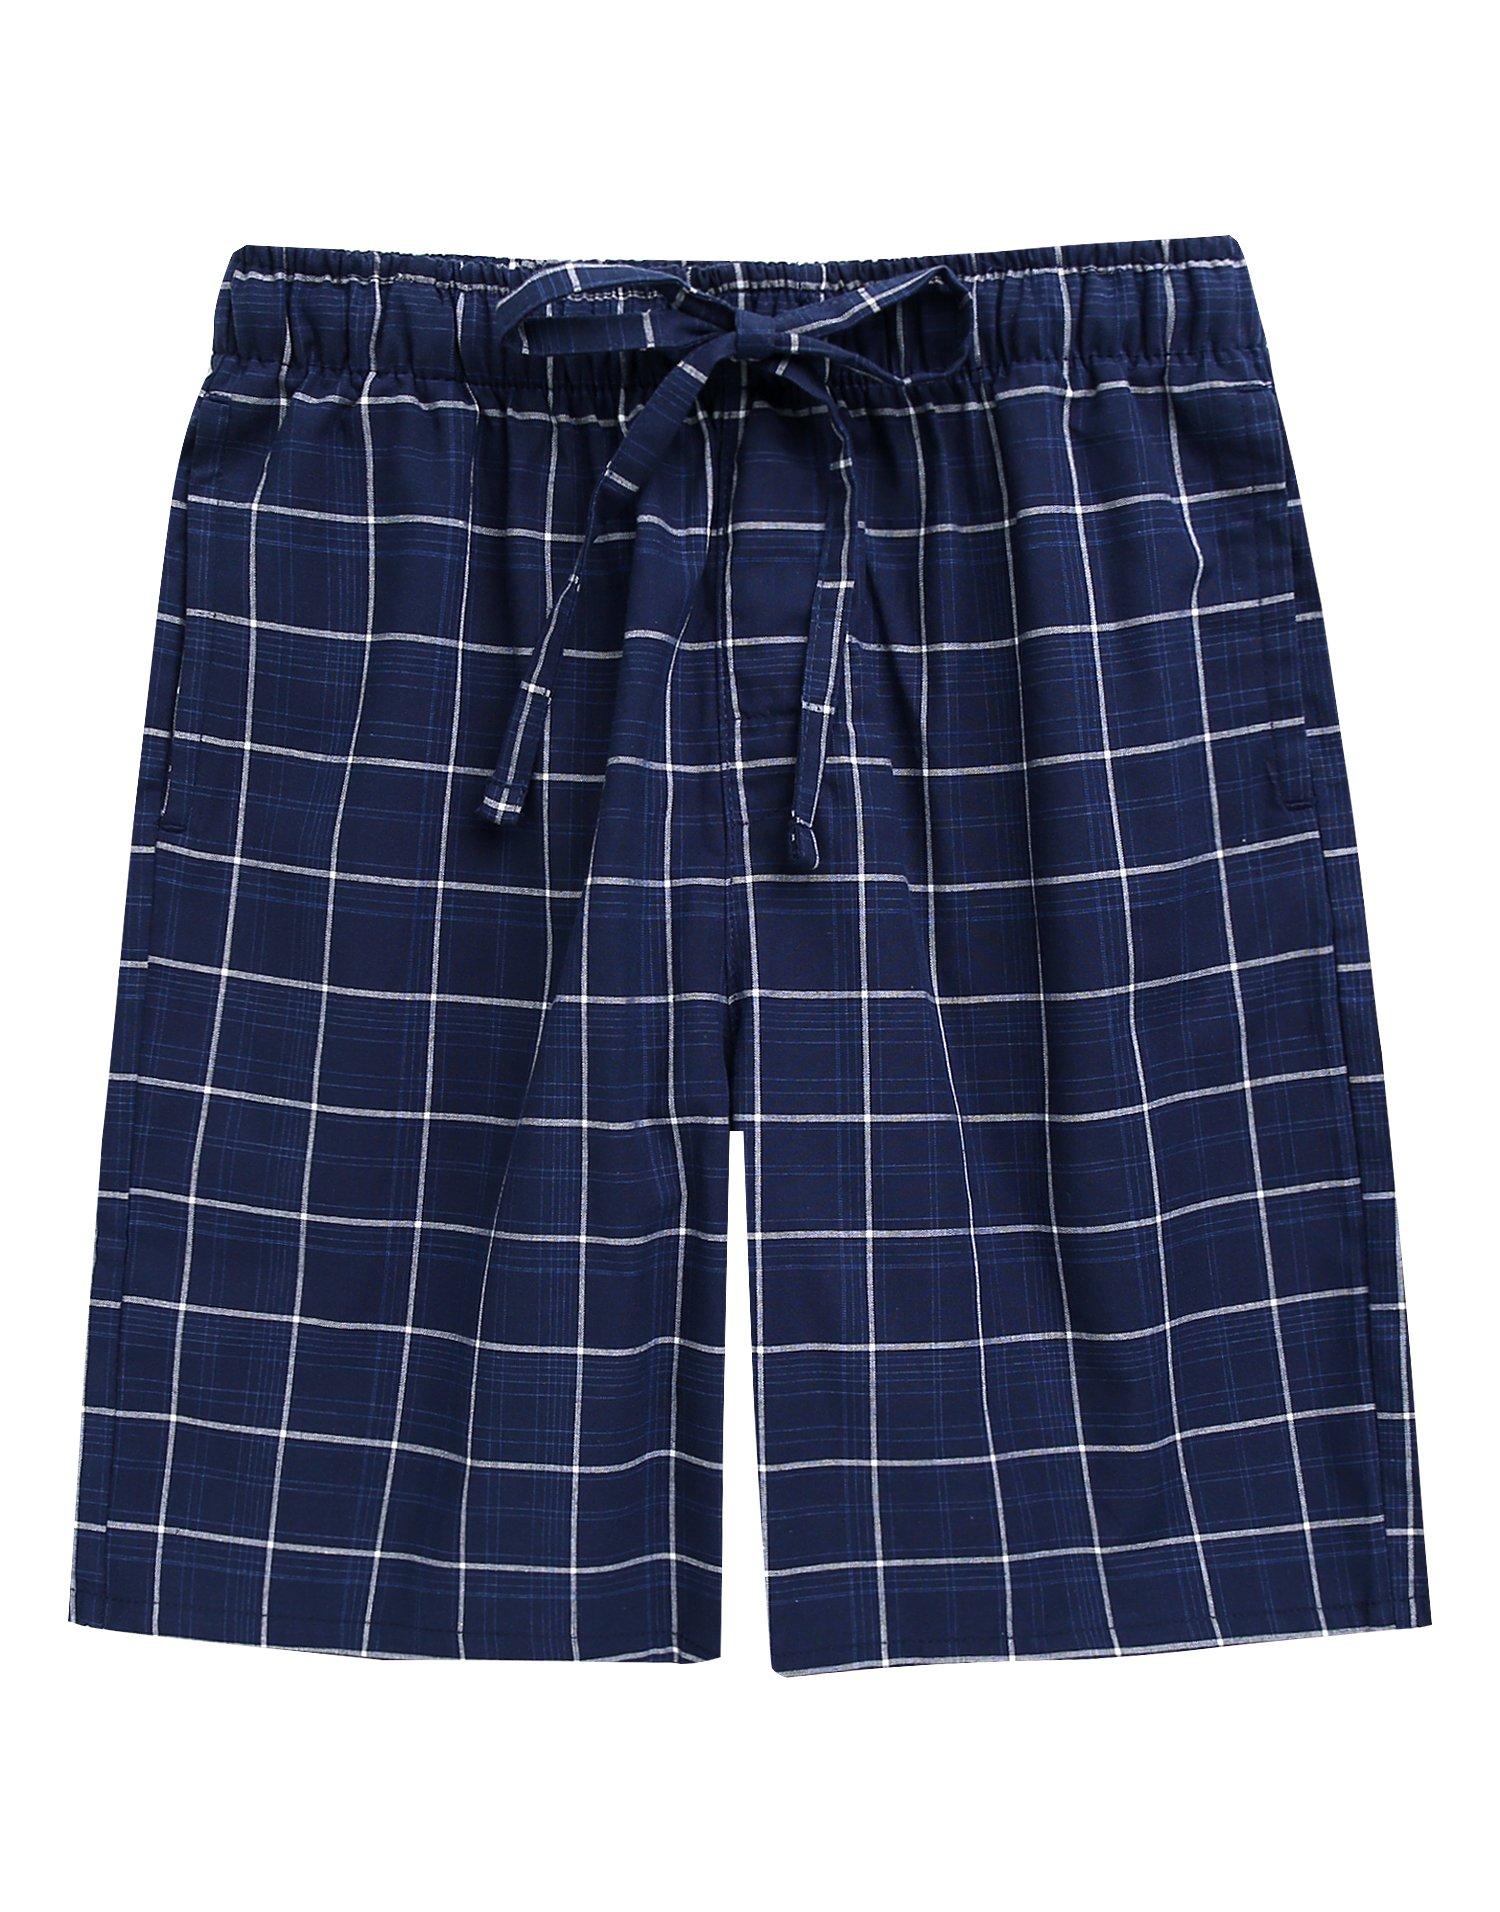 TINFL Men's Plaid Check Cotton Lounge Sleep Shorts MSP-SB015-Navy L